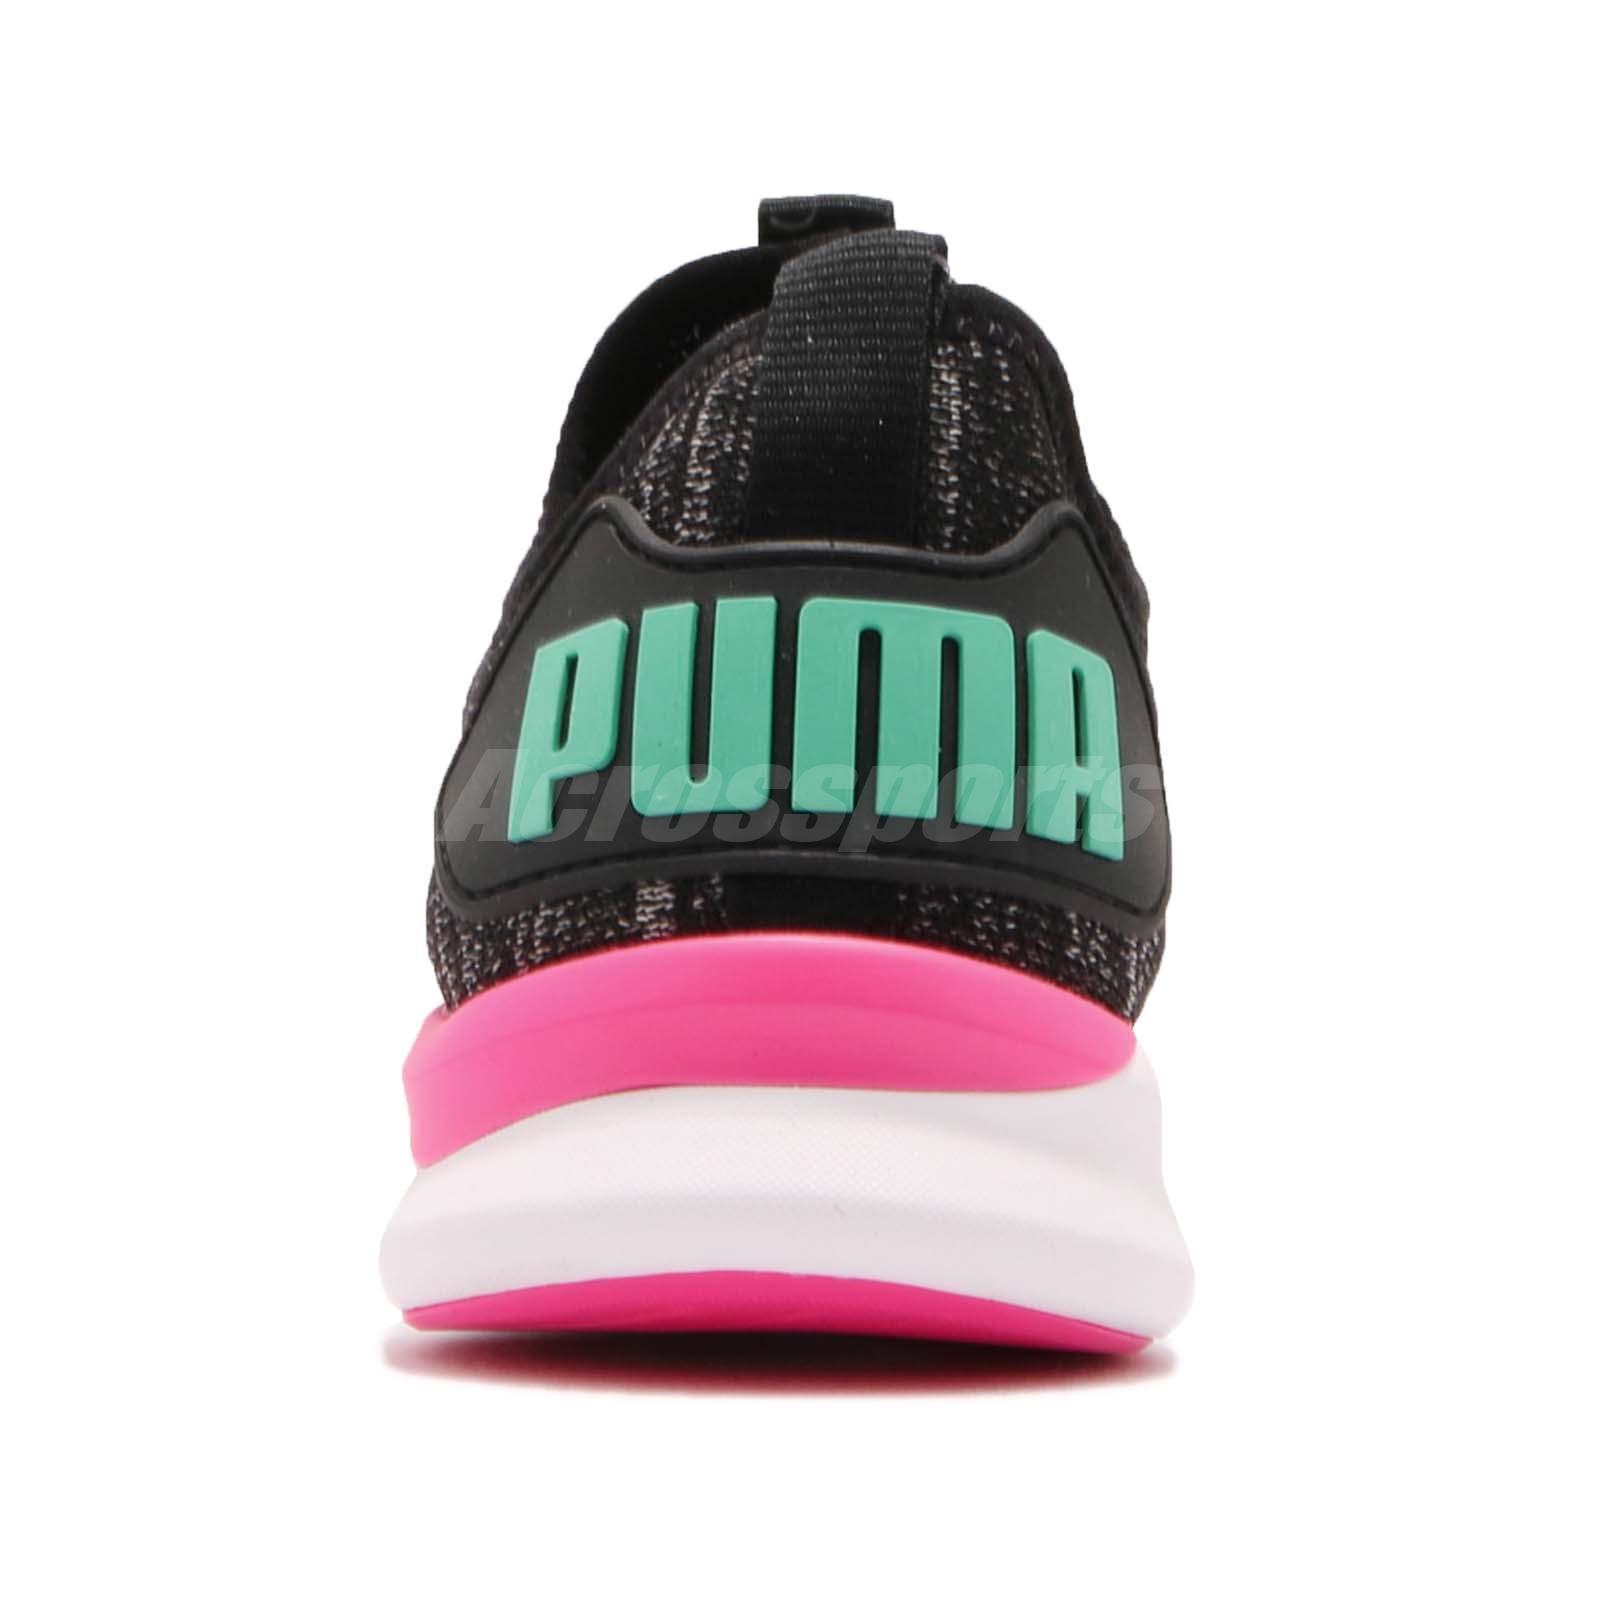 Puma IGNITE Flash EvoKNIT Wns Lewis Hamilton Black Pink Training ... 055b23909